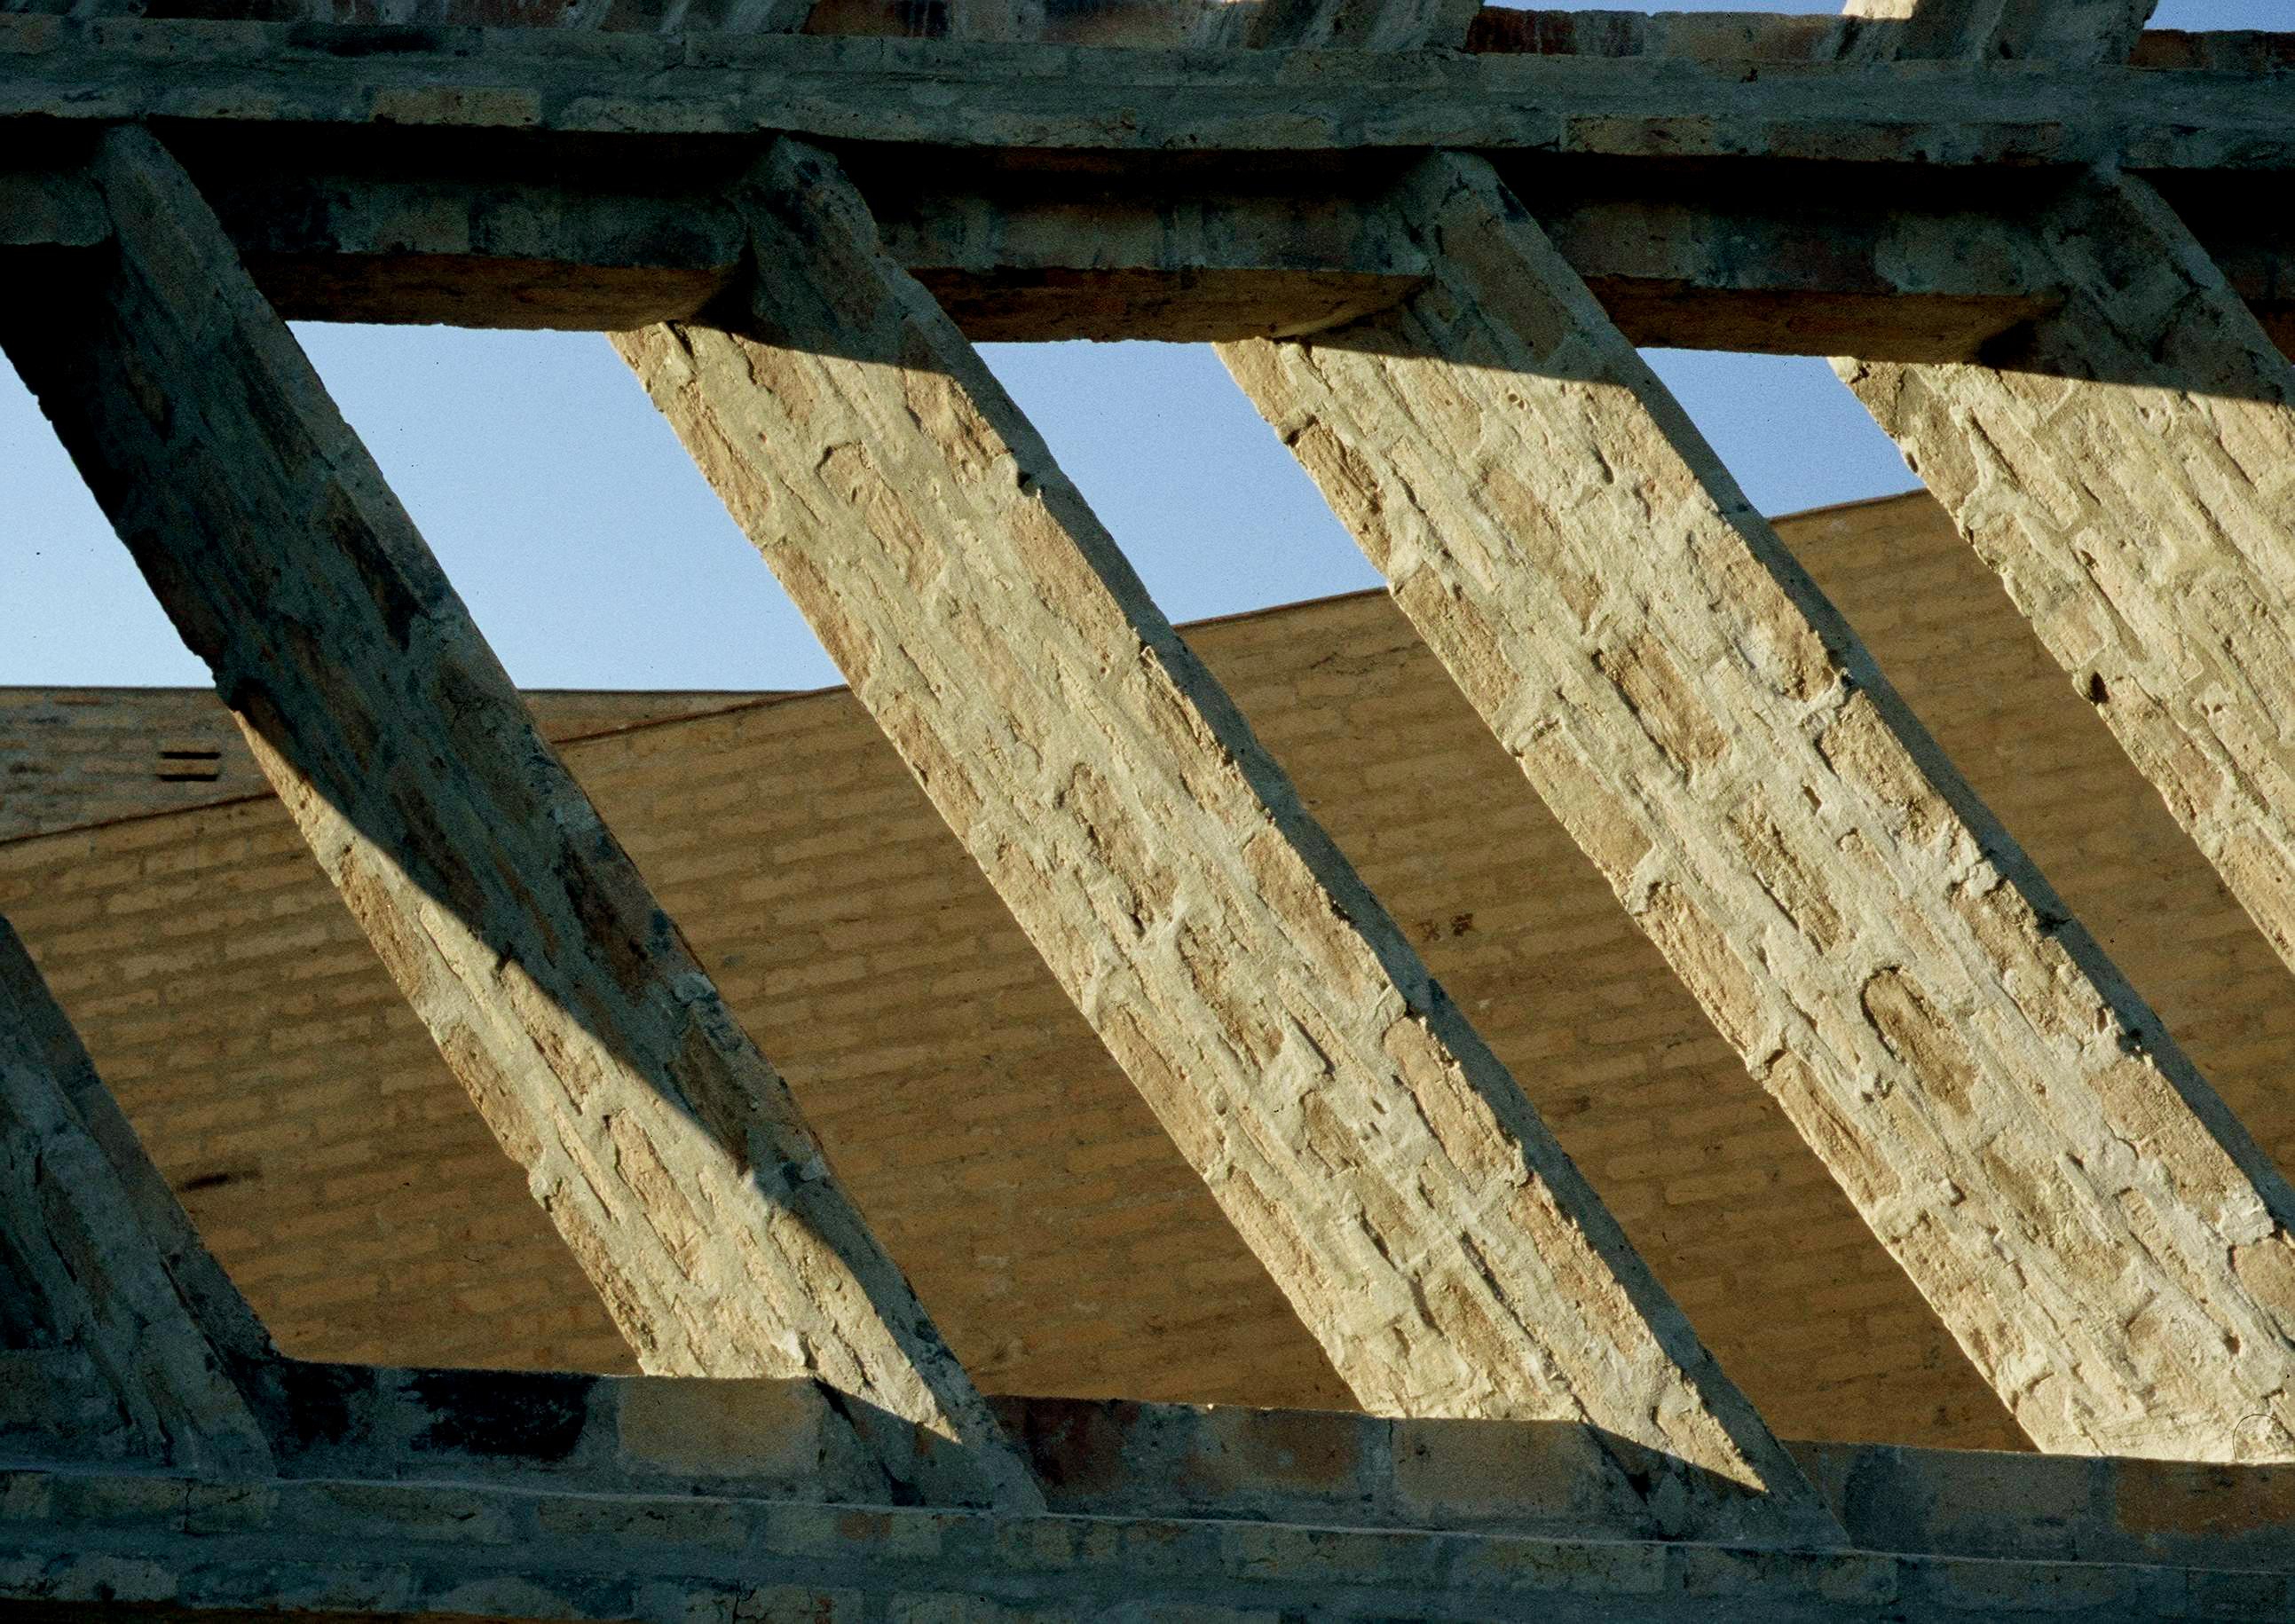 Clássicos da Arquitetura: Unilever Paraguai / Gabinete de Arquitectura ,  Cortesía de Gabinete de Arquitectura